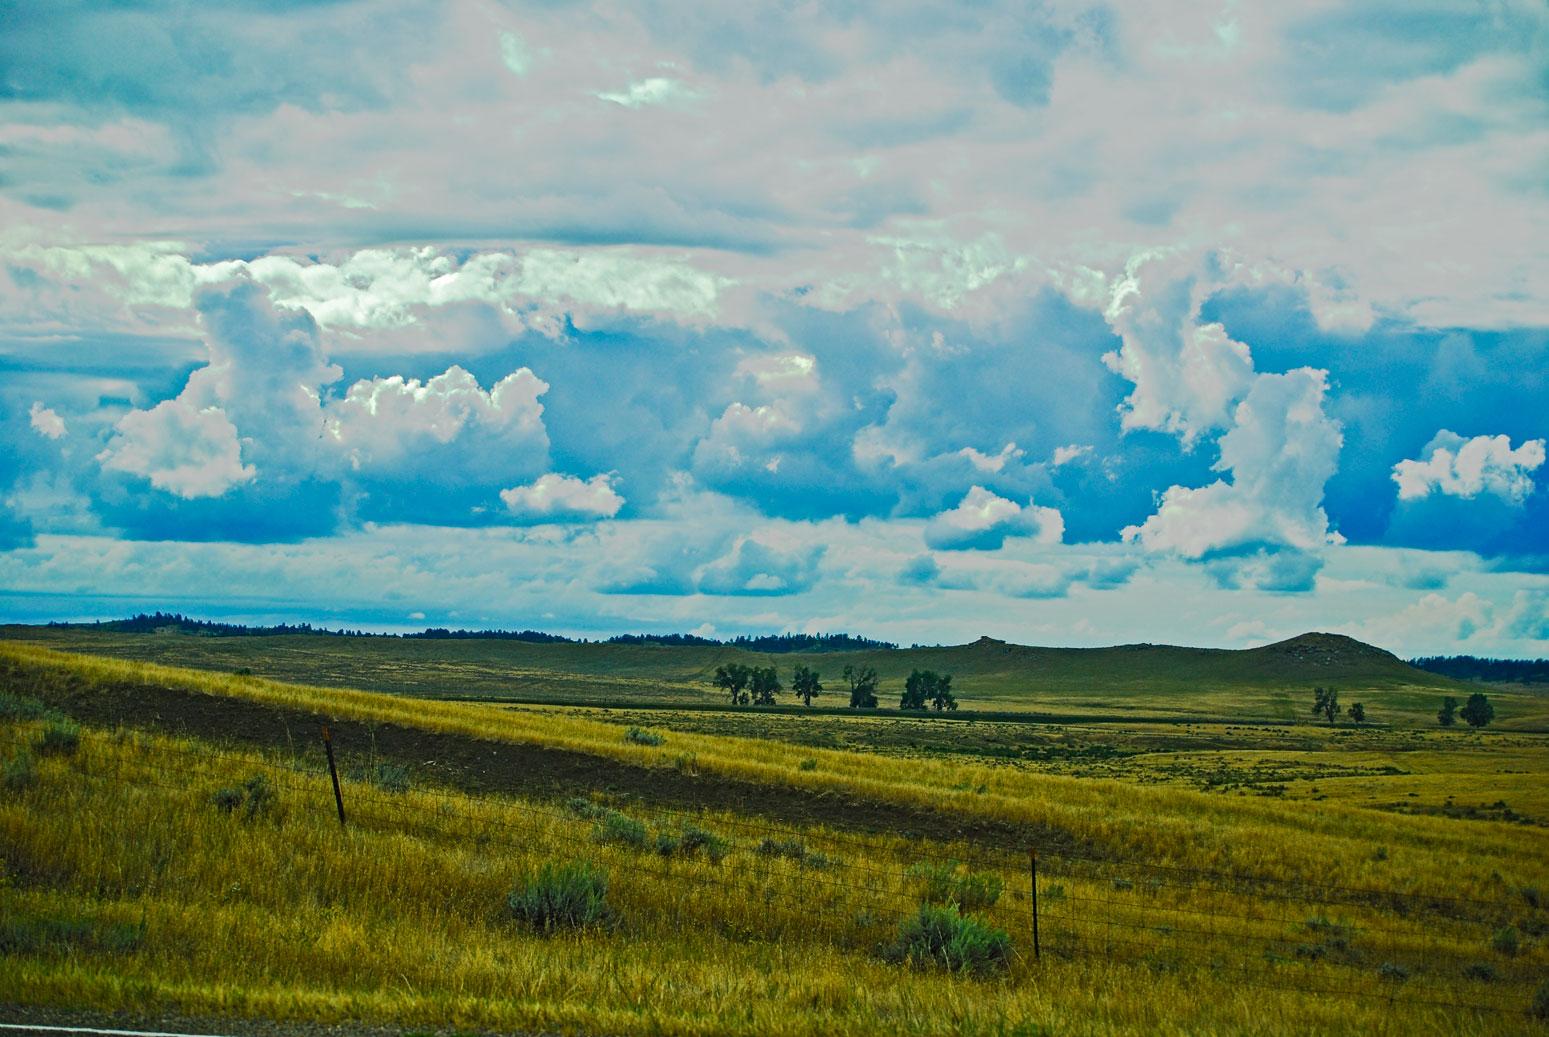 Montana rosebud county forsyth - The Big Sky Rosebud County